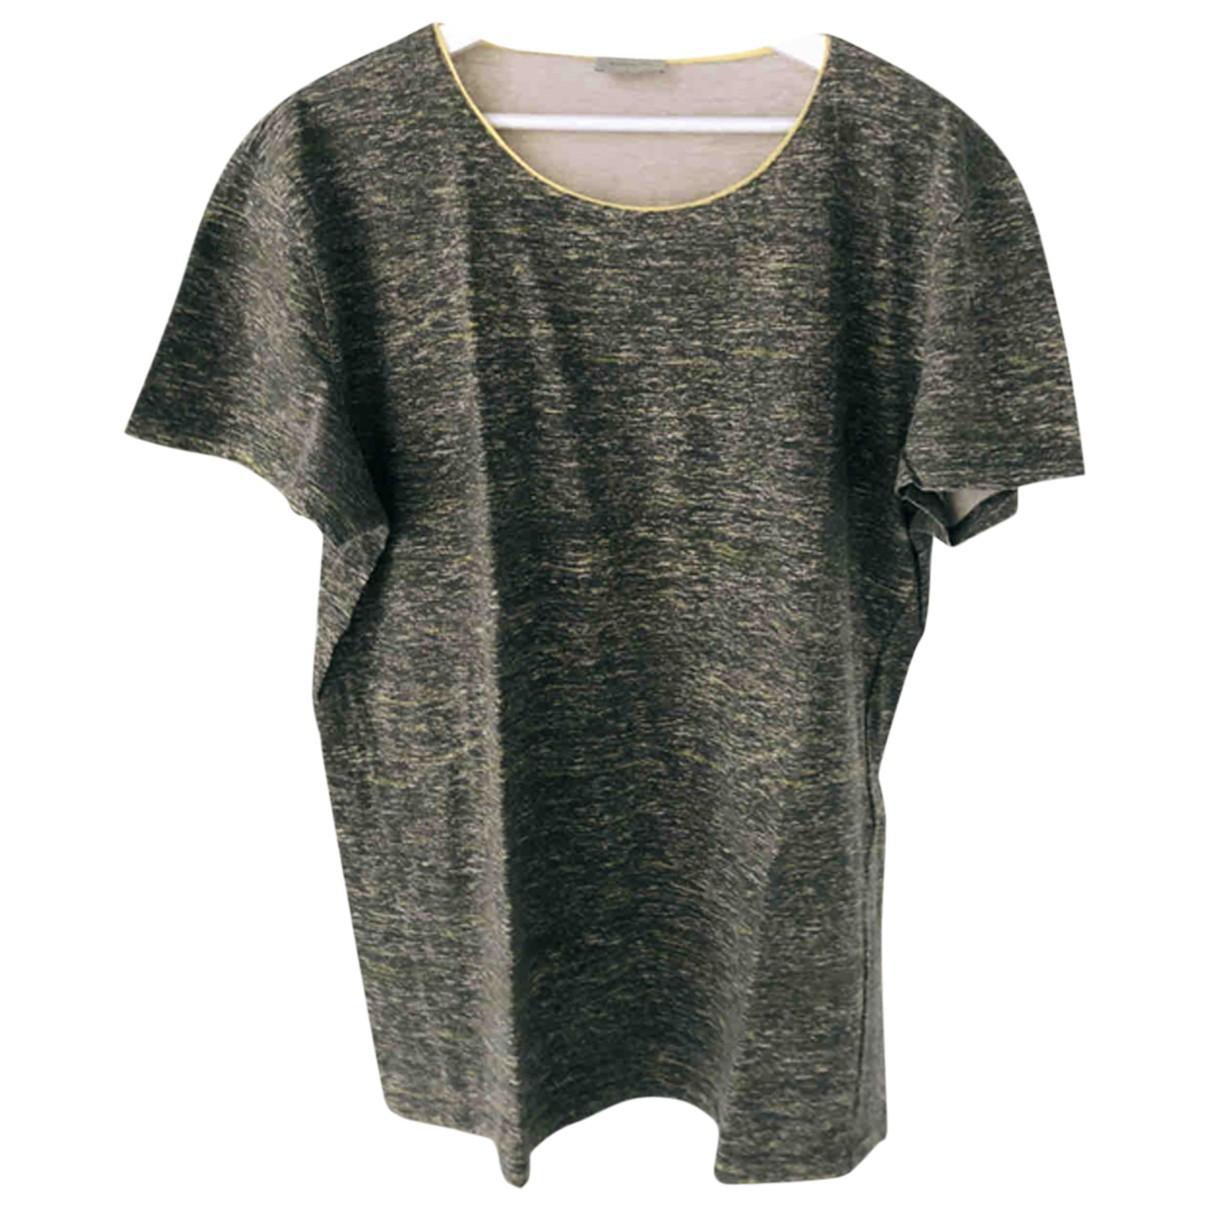 Balenciaga \N Cotton T-shirts for Men XL International